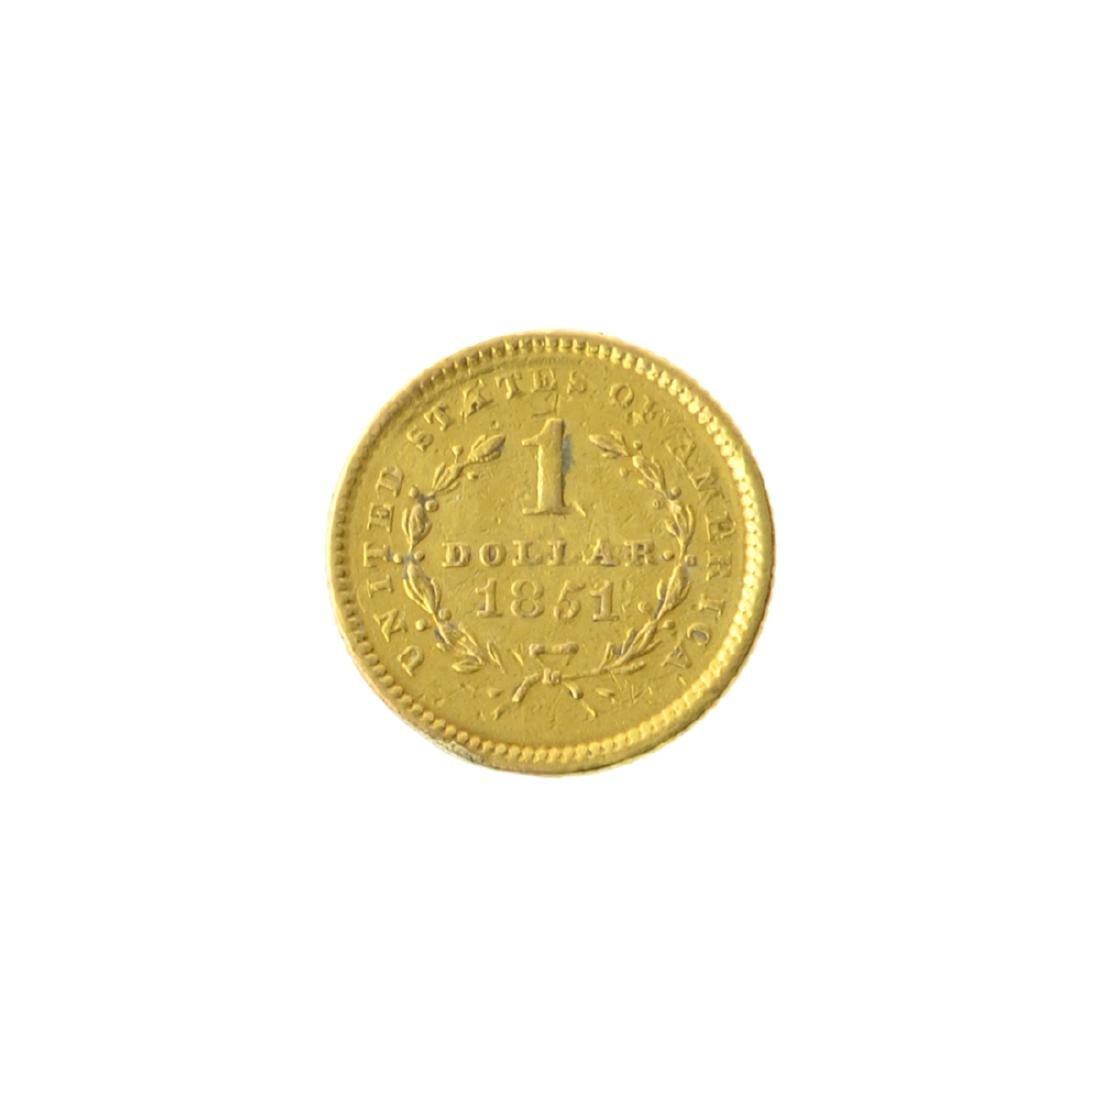 *1851 $1 U.S. Liberty Head Gold Coin (JG-MRT) - 2